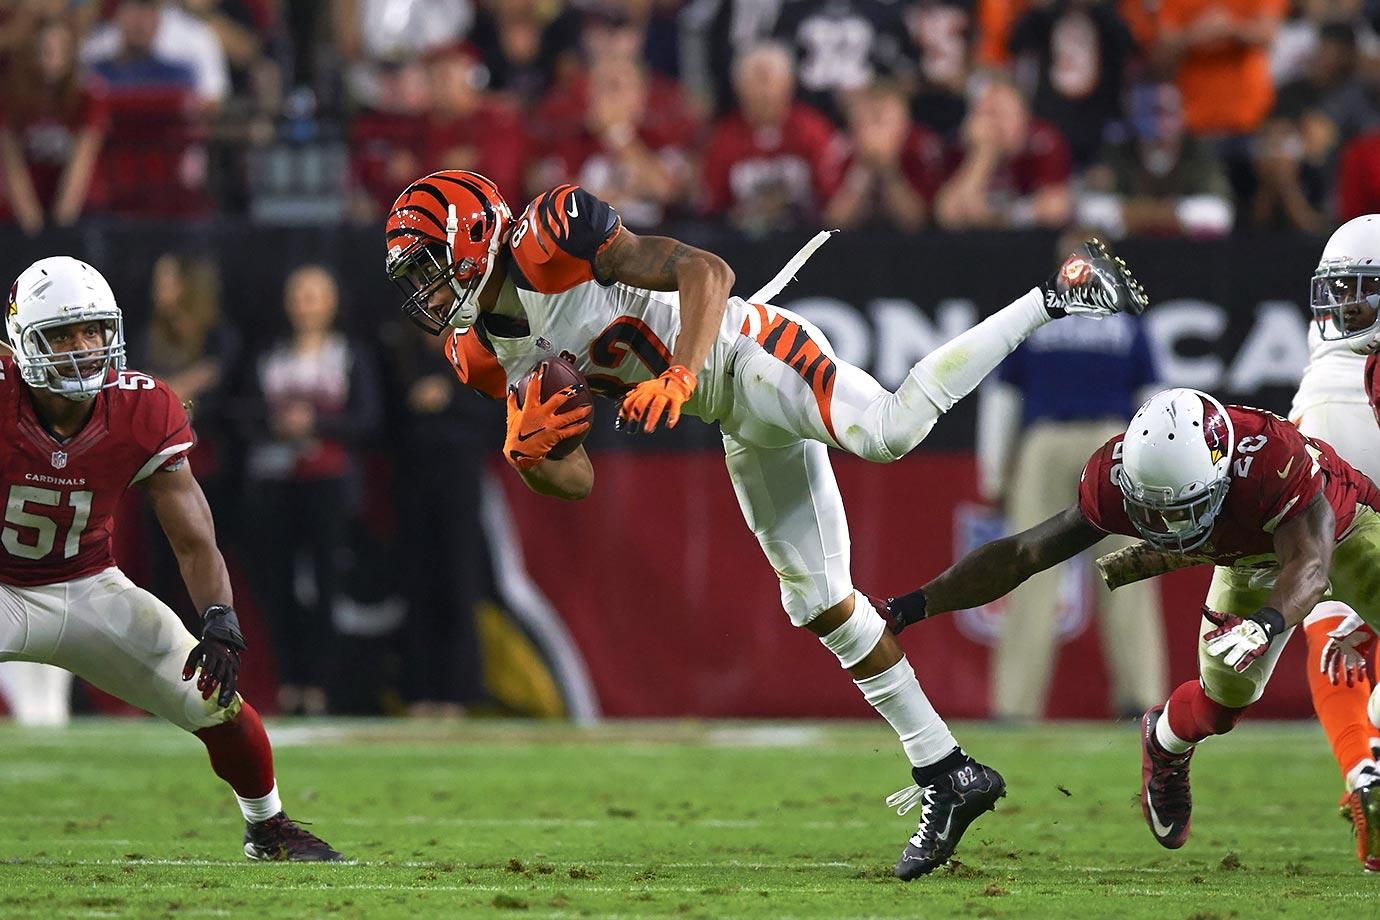 2015 Team: Cincinnati Bengals — 2016 Team: Detroit Lions